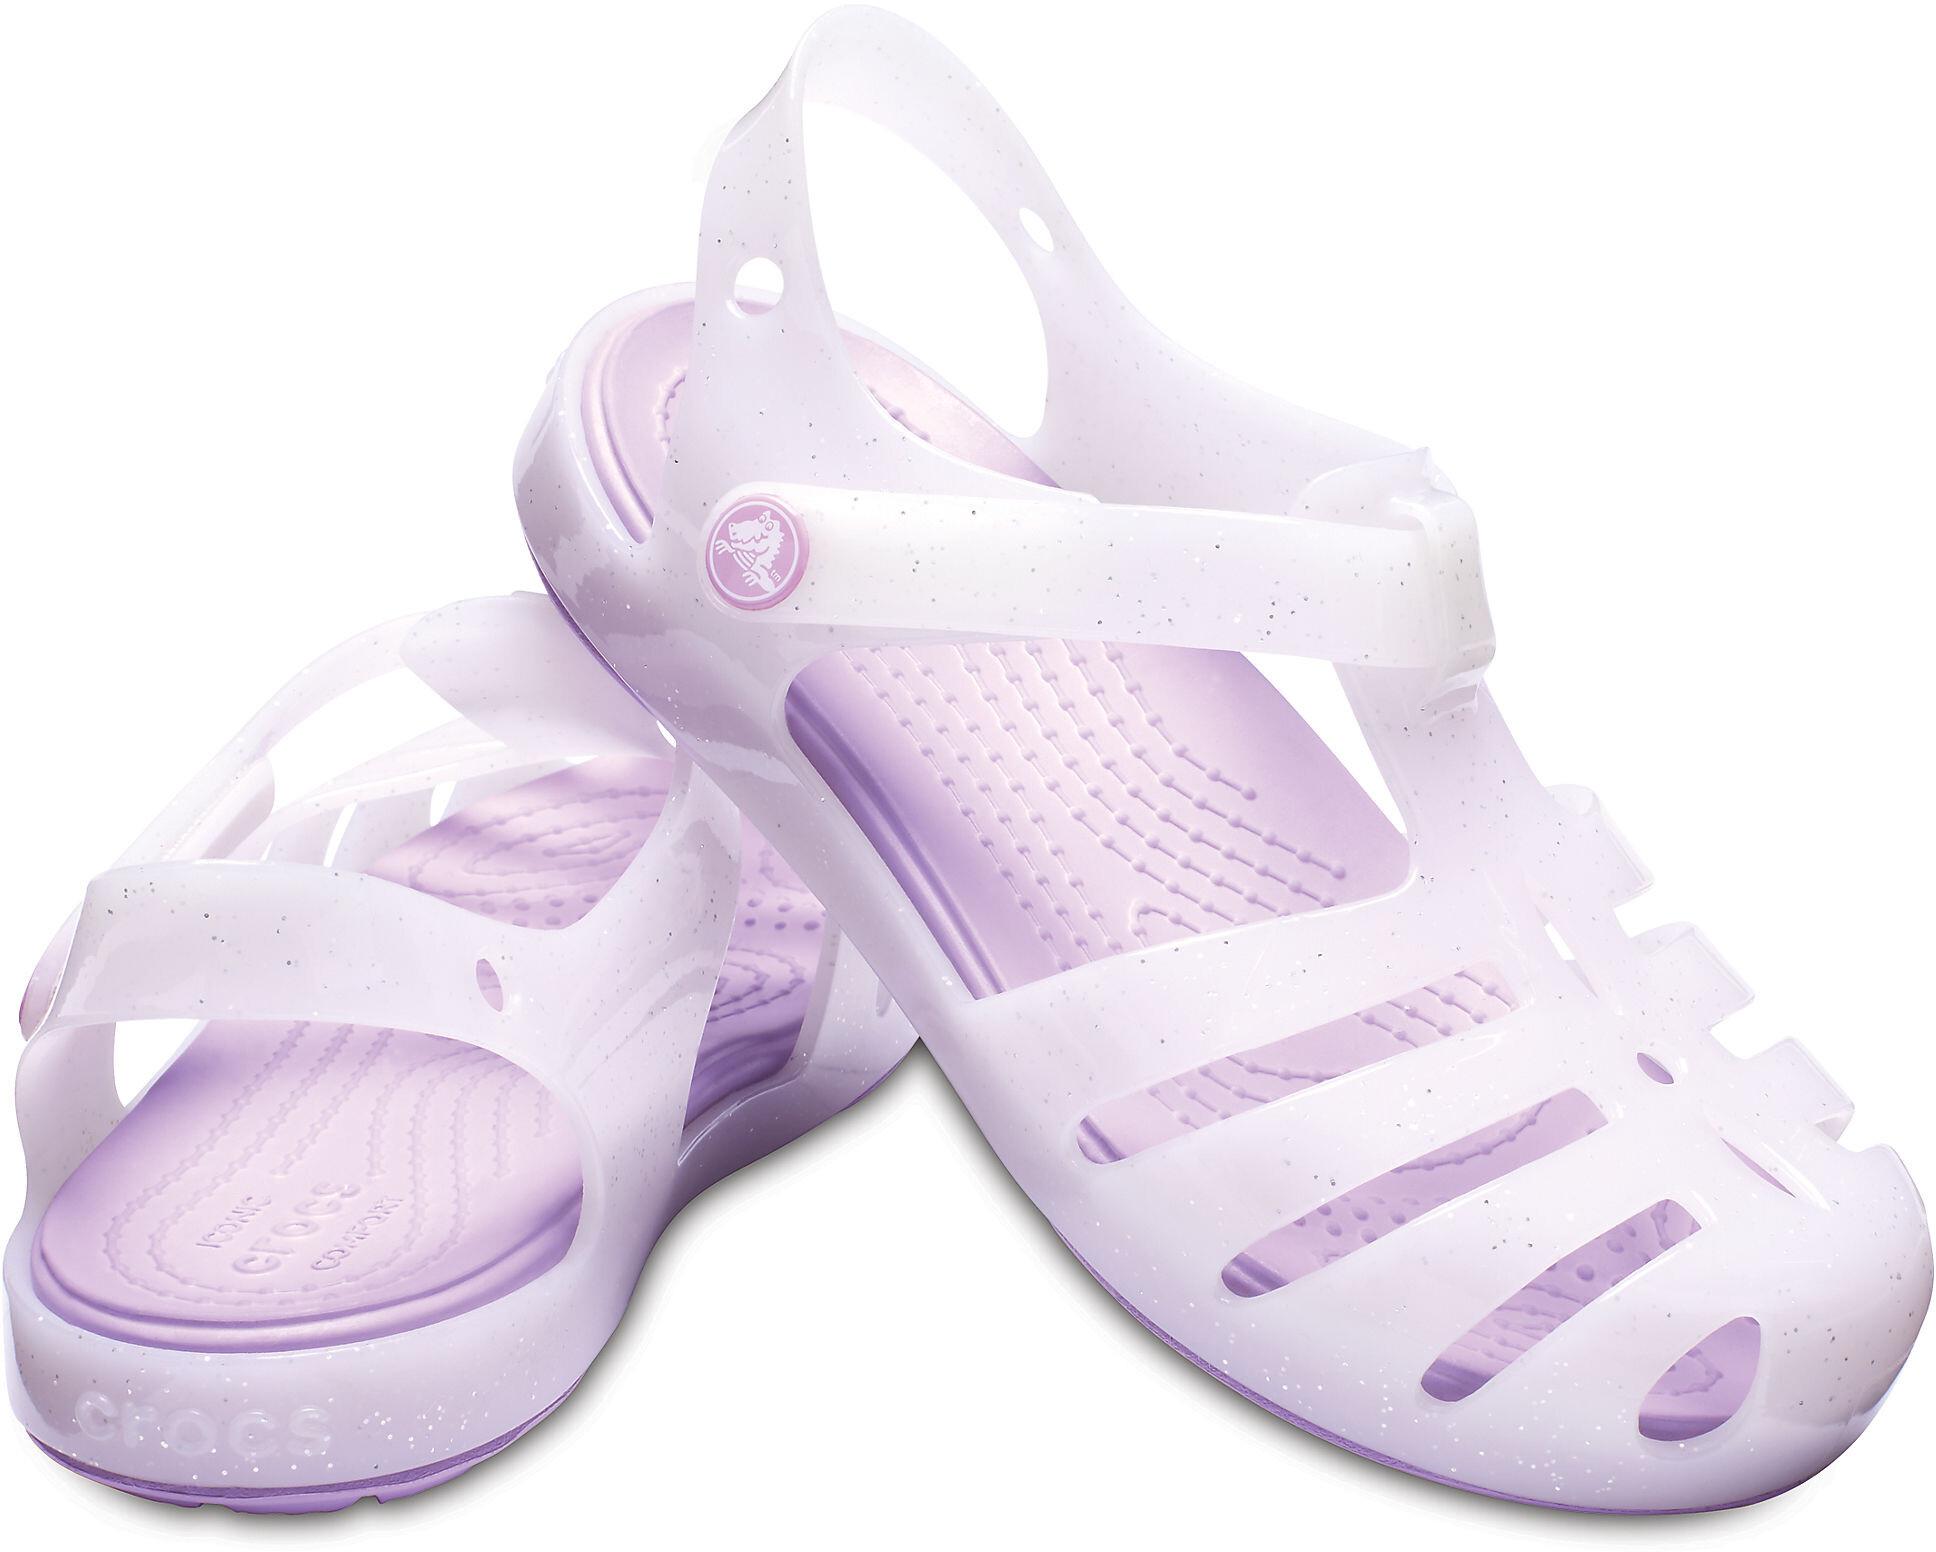 78ff0d0cb8e9 Crocs Isabella PS Sandaler Børn hvid